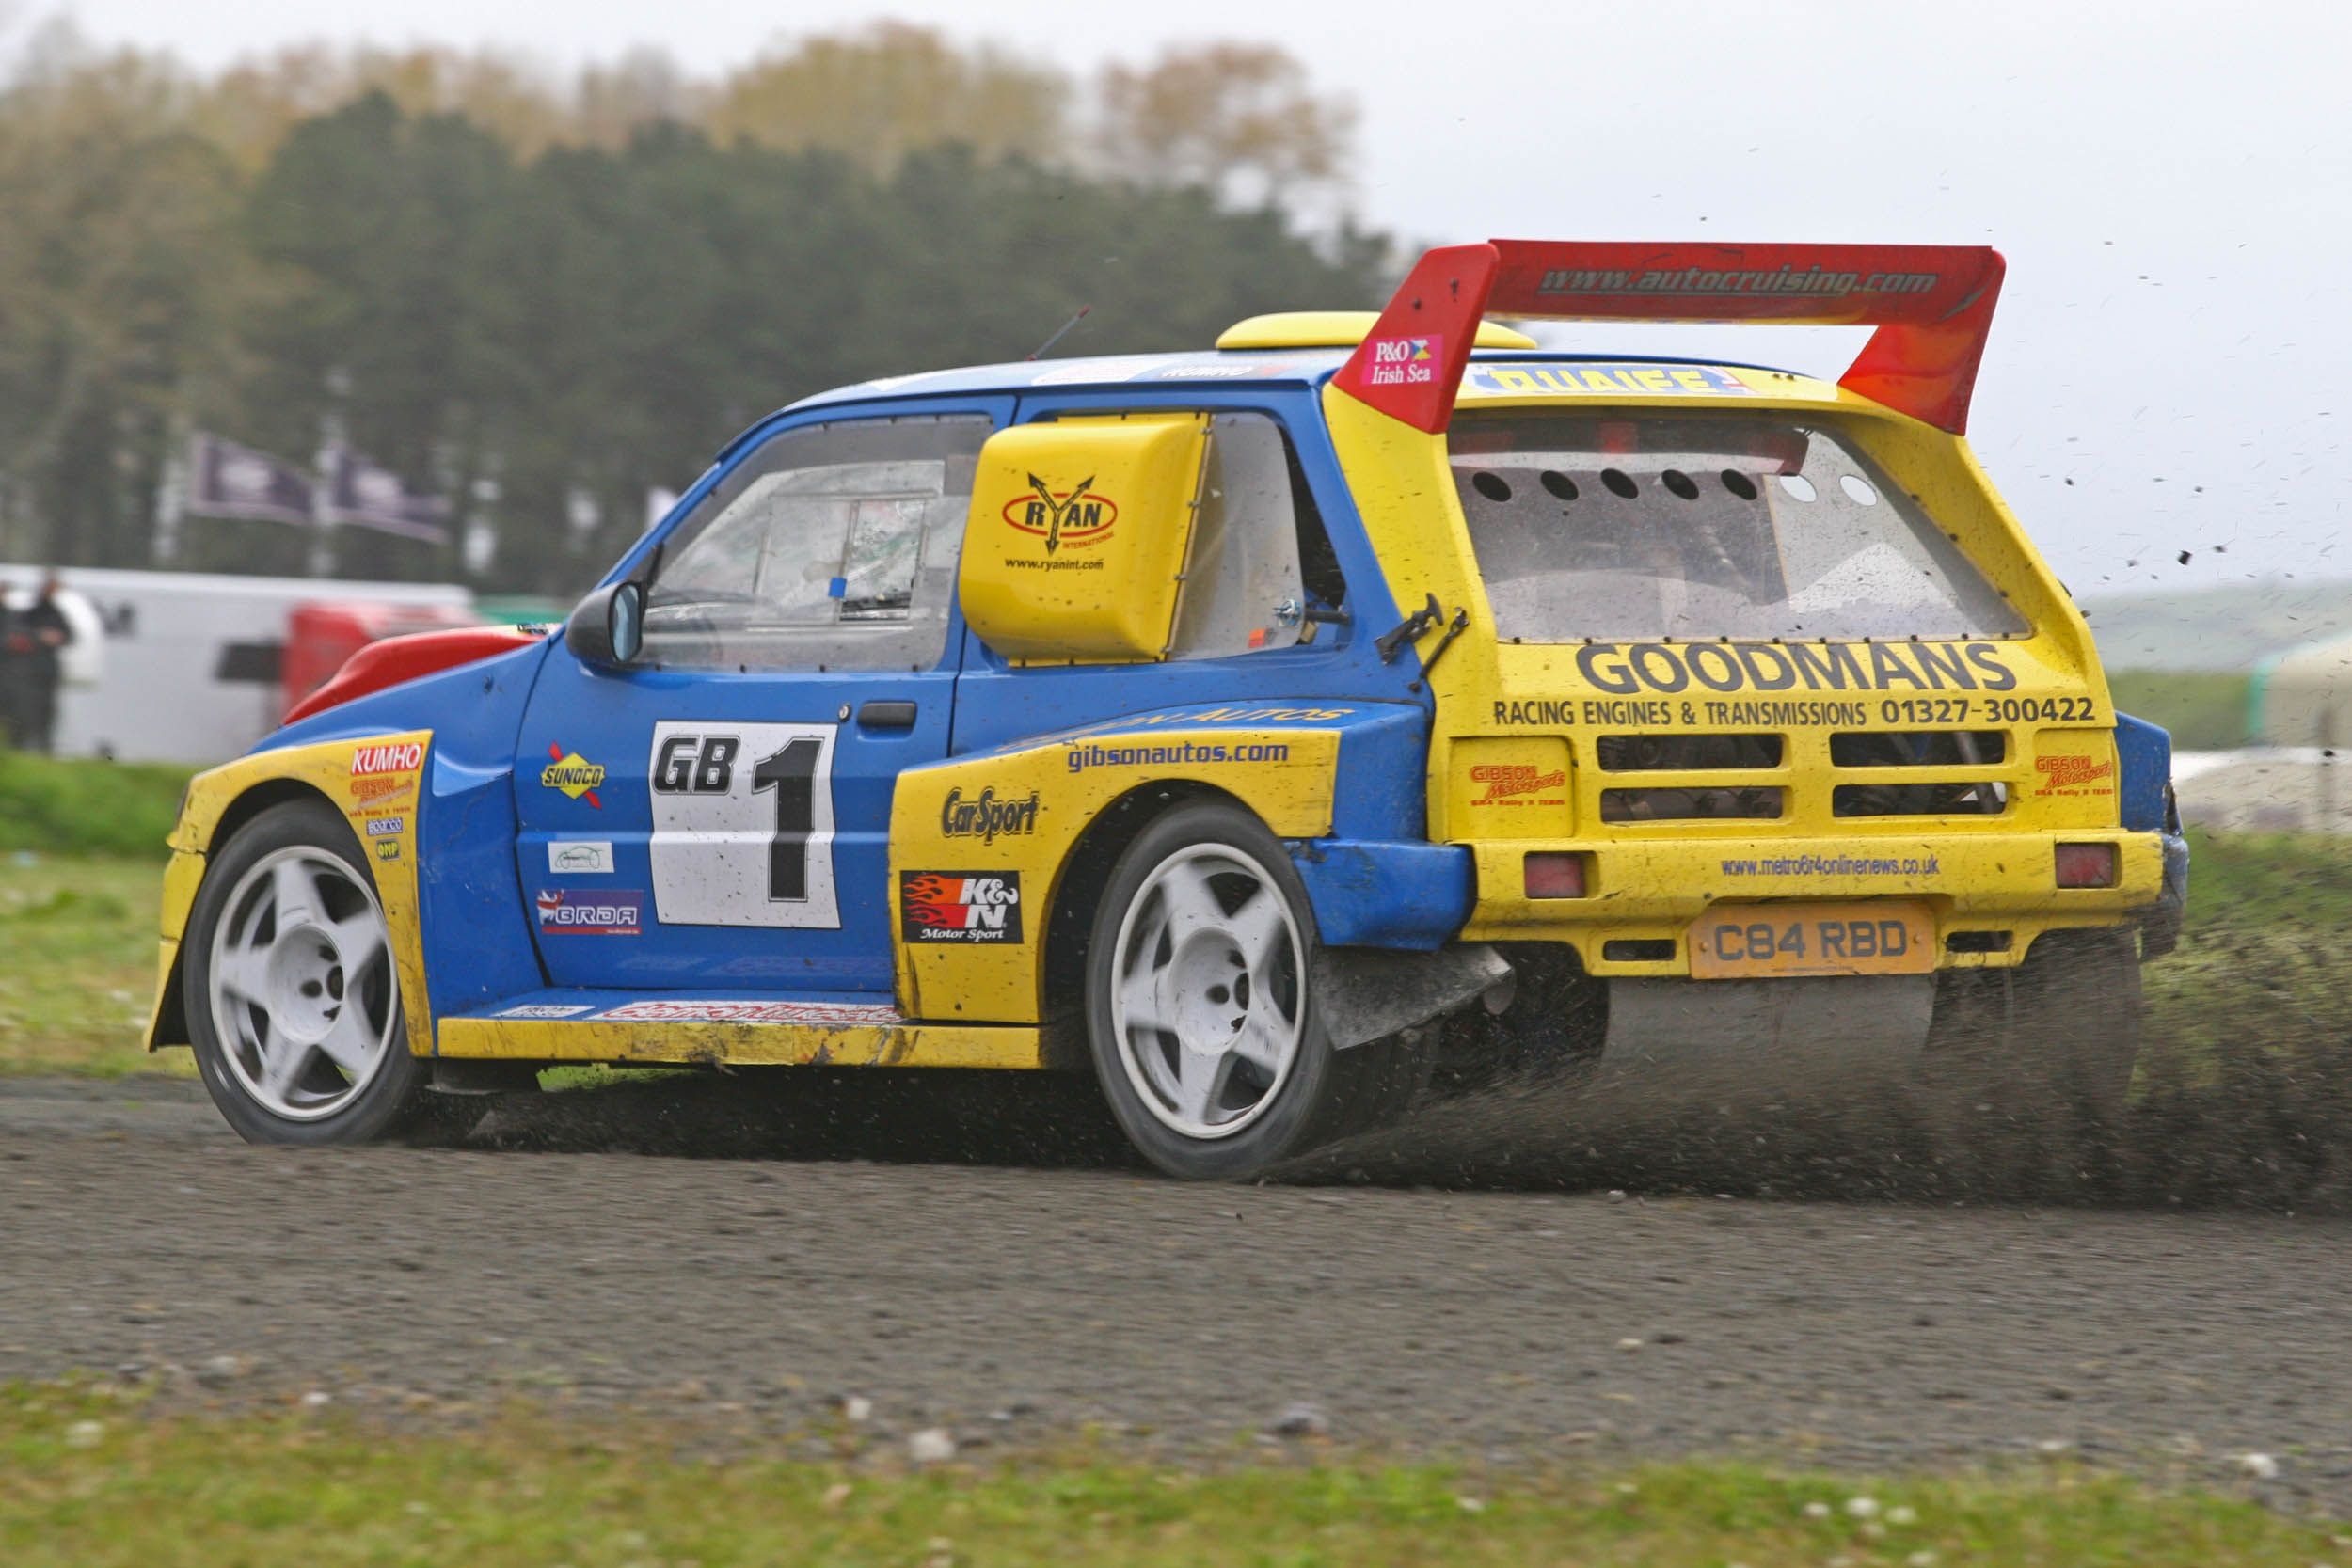 MG Metro 6R4 rallycross car | Rally Racing | Pinterest | Cars ...